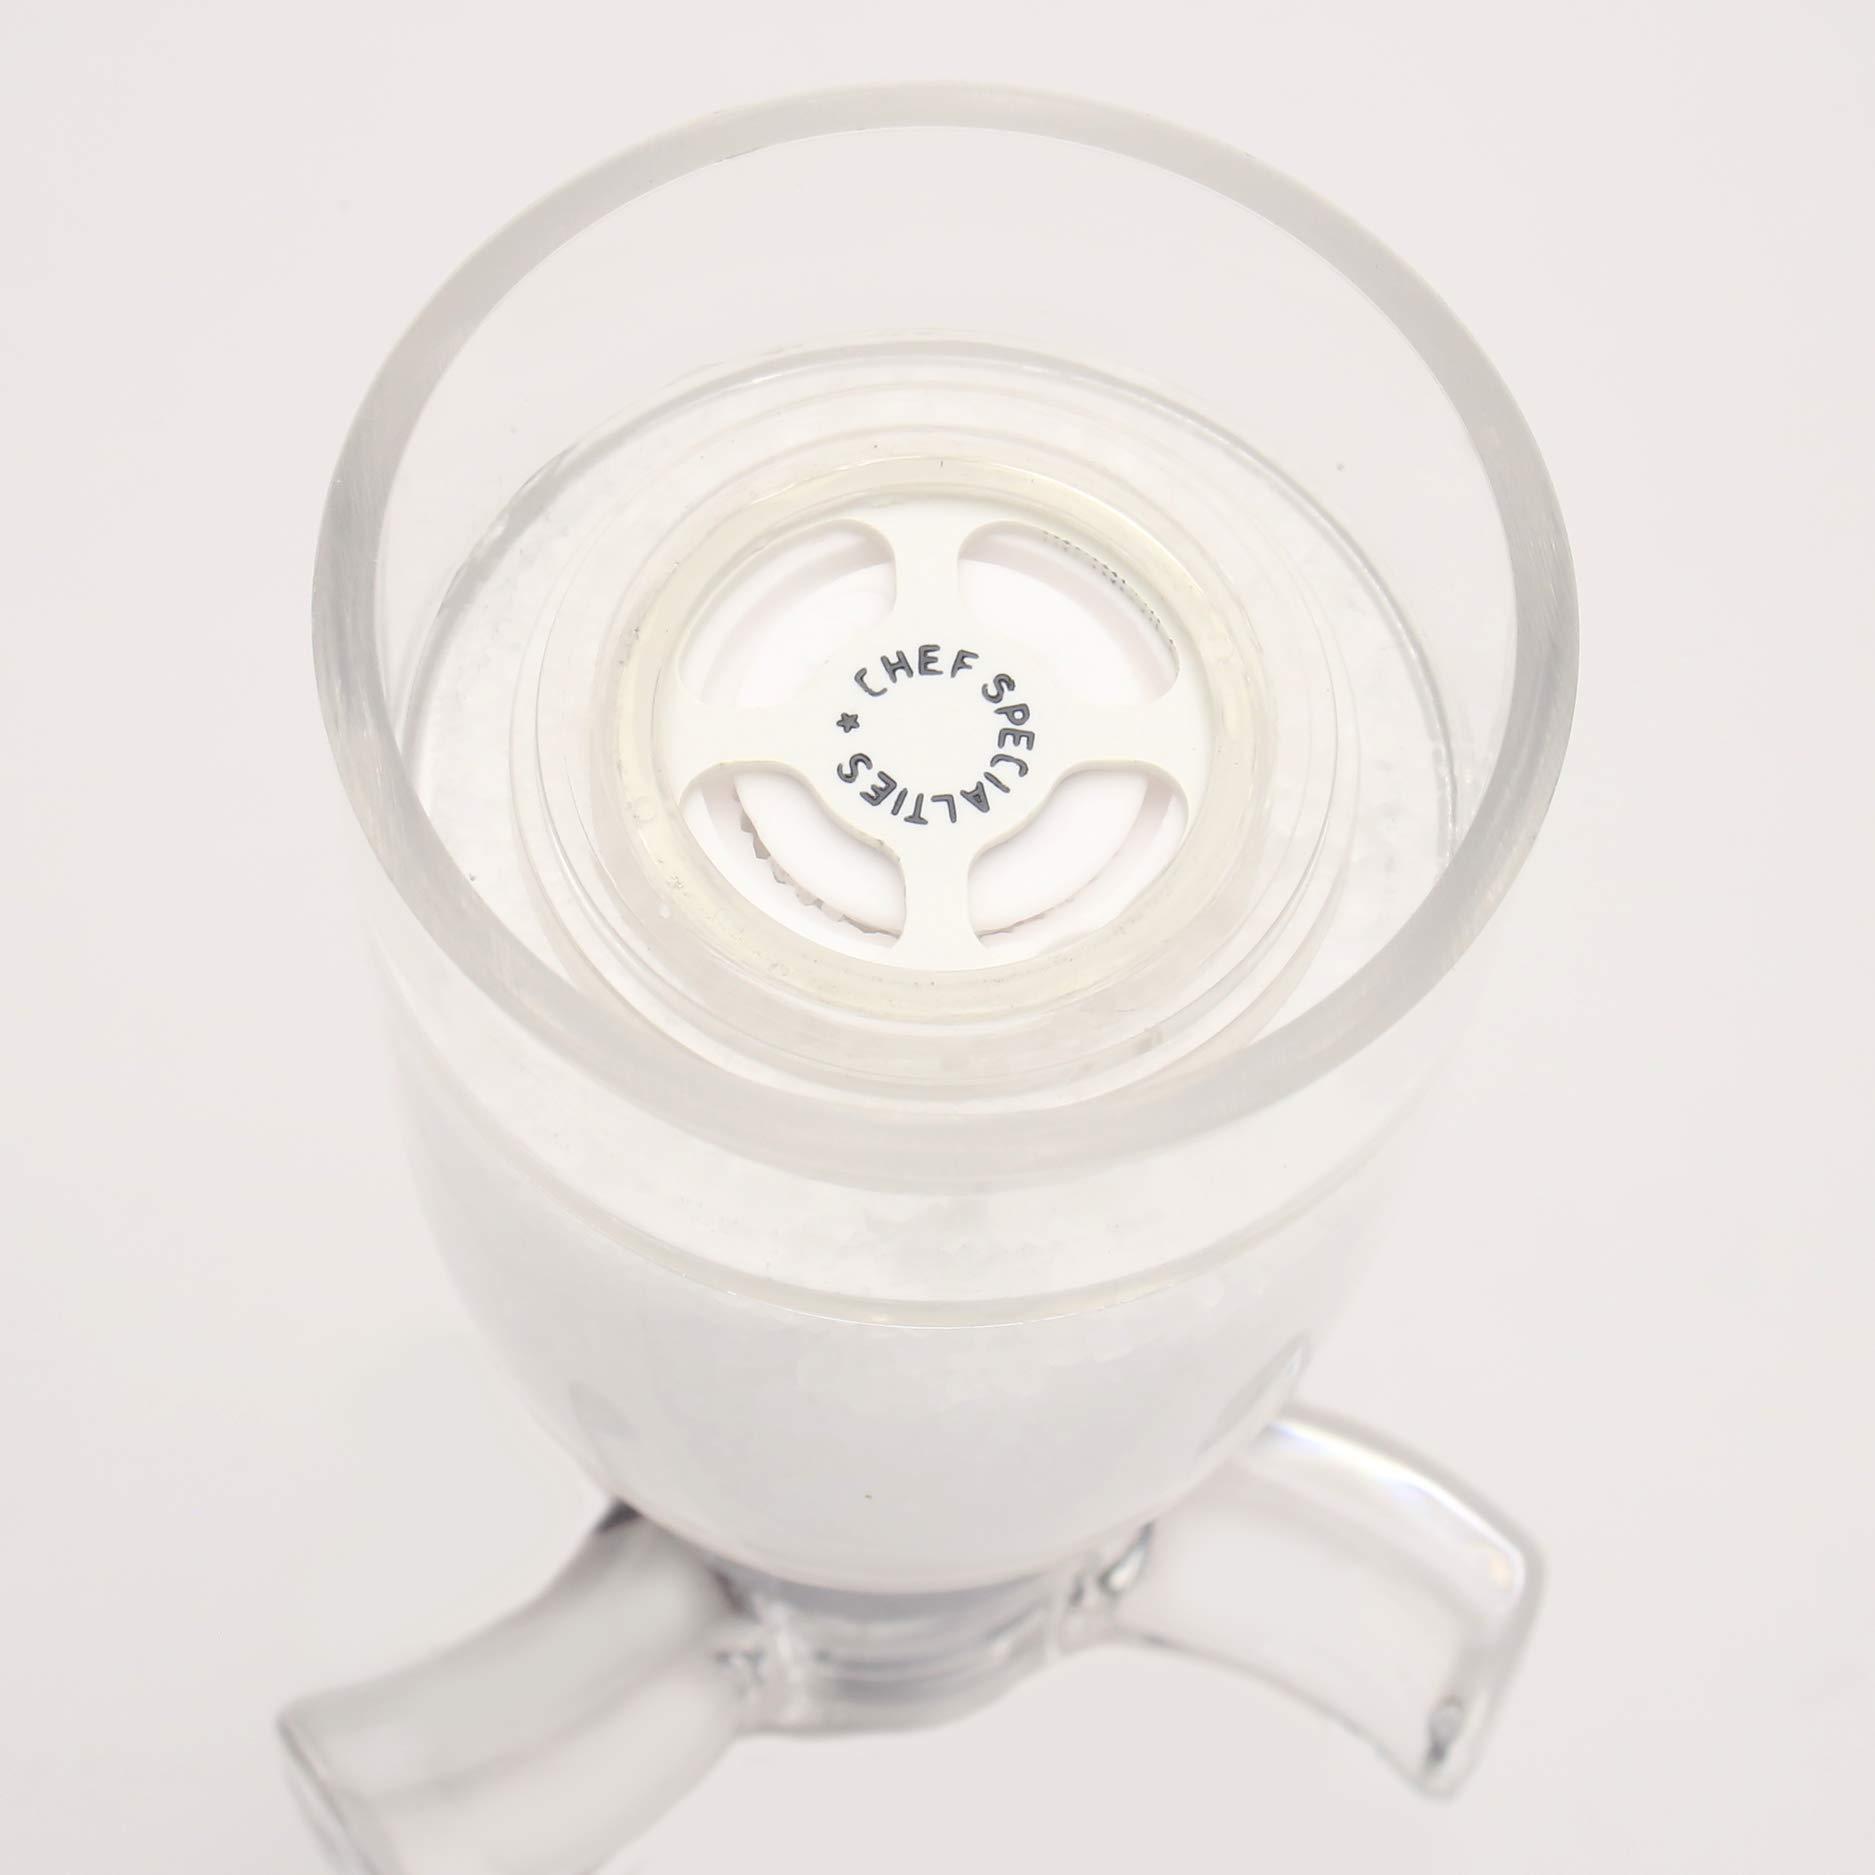 Chef Specialties 4.25 Inch Spinner Salt Mill